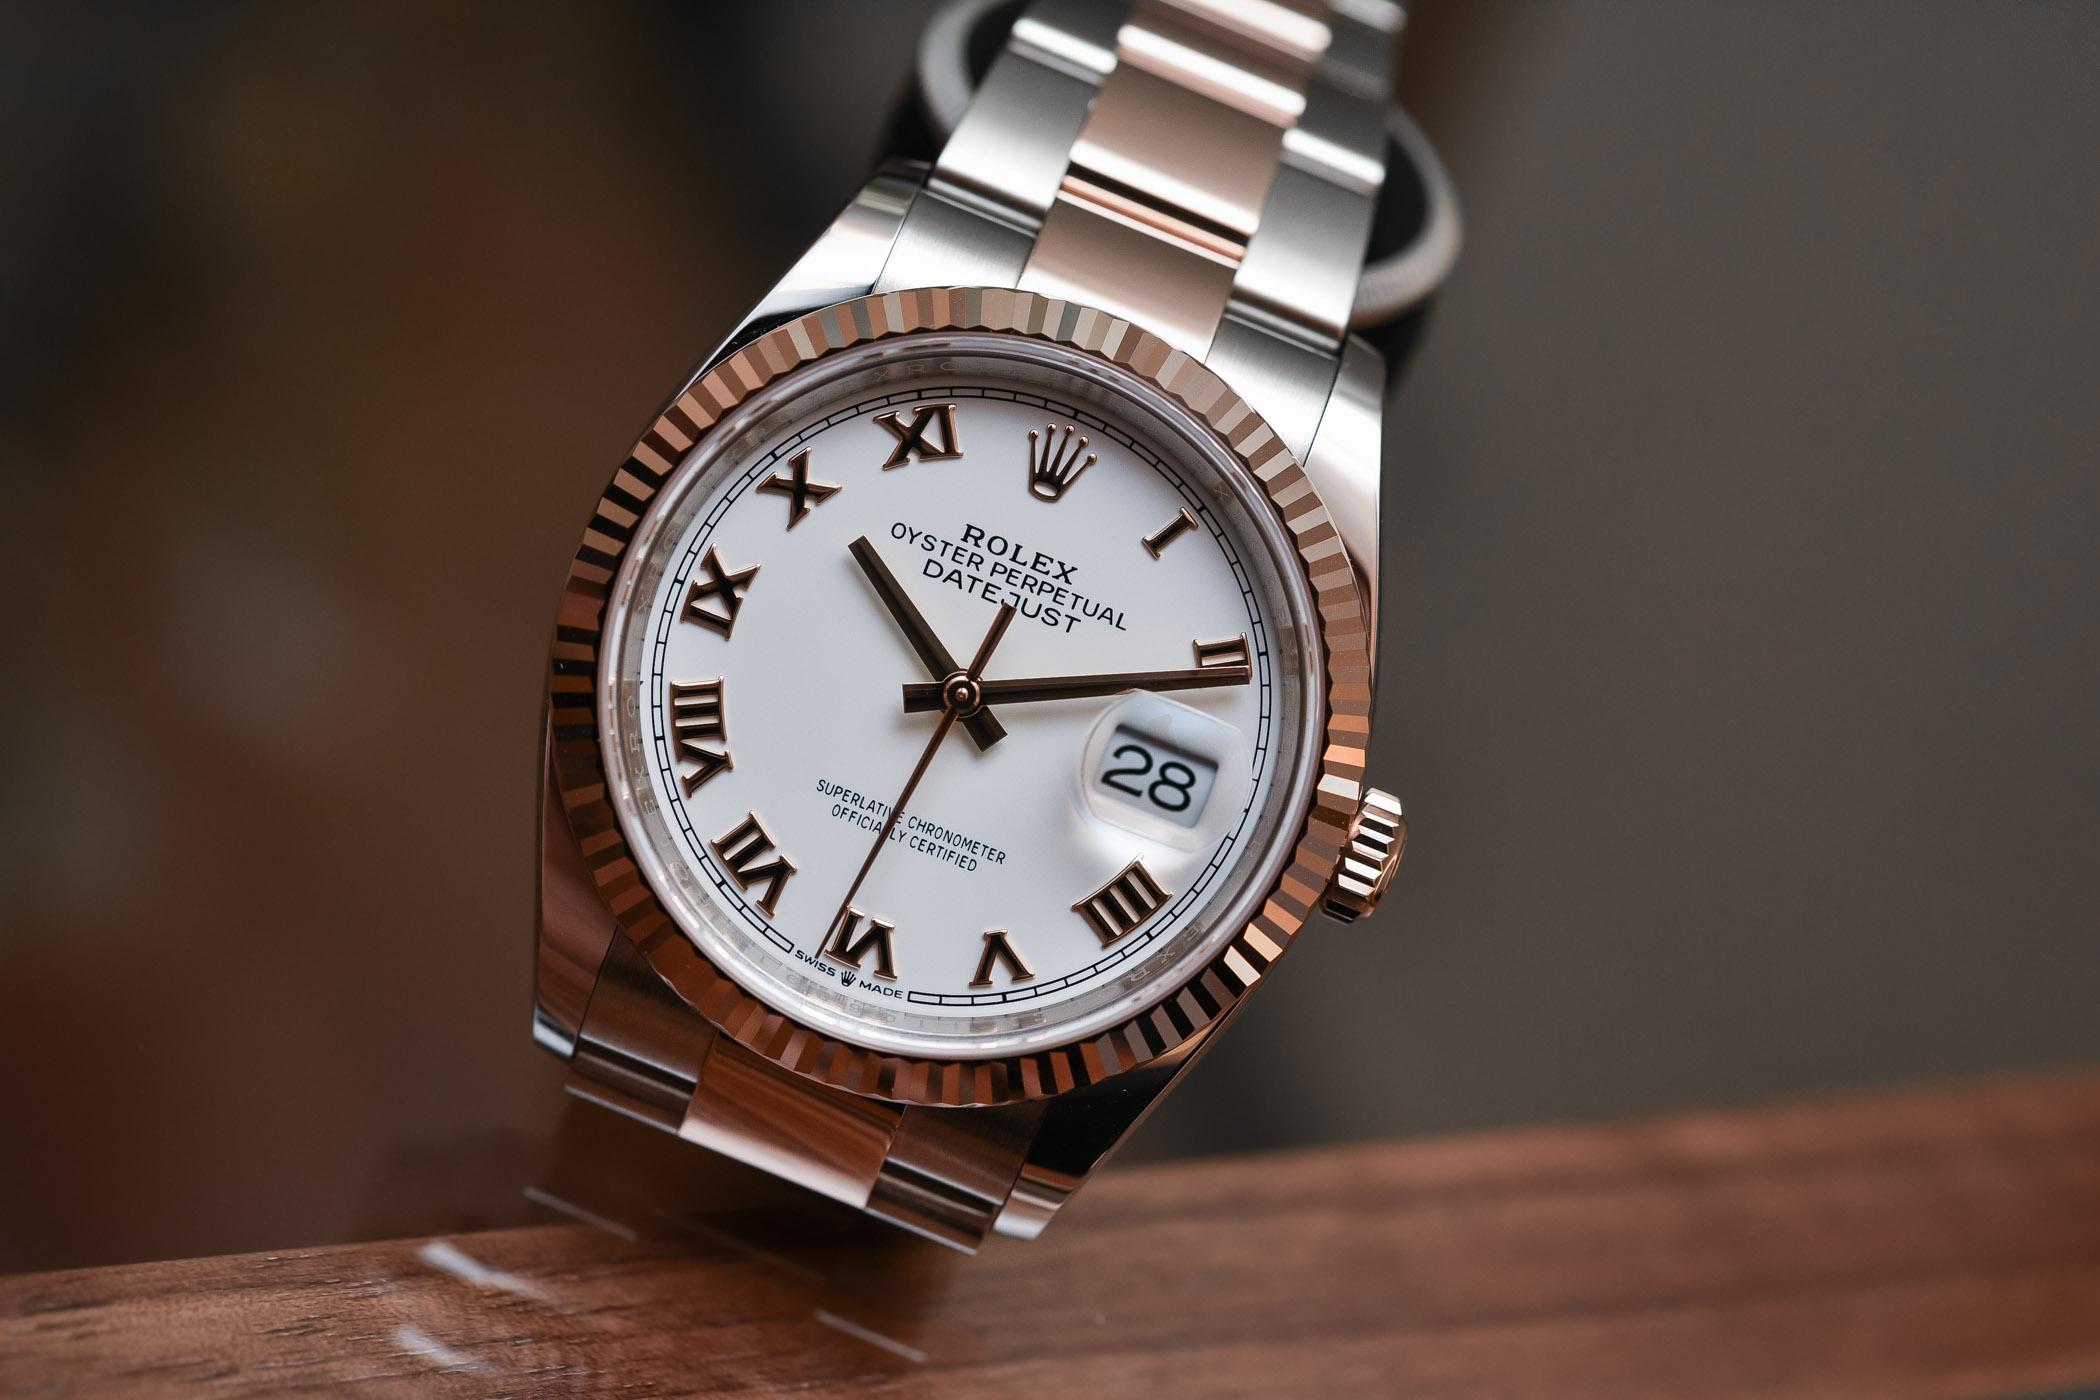 2018 Rolex Datejust 36 ref 126231 Rolesor Everose calibre 3235